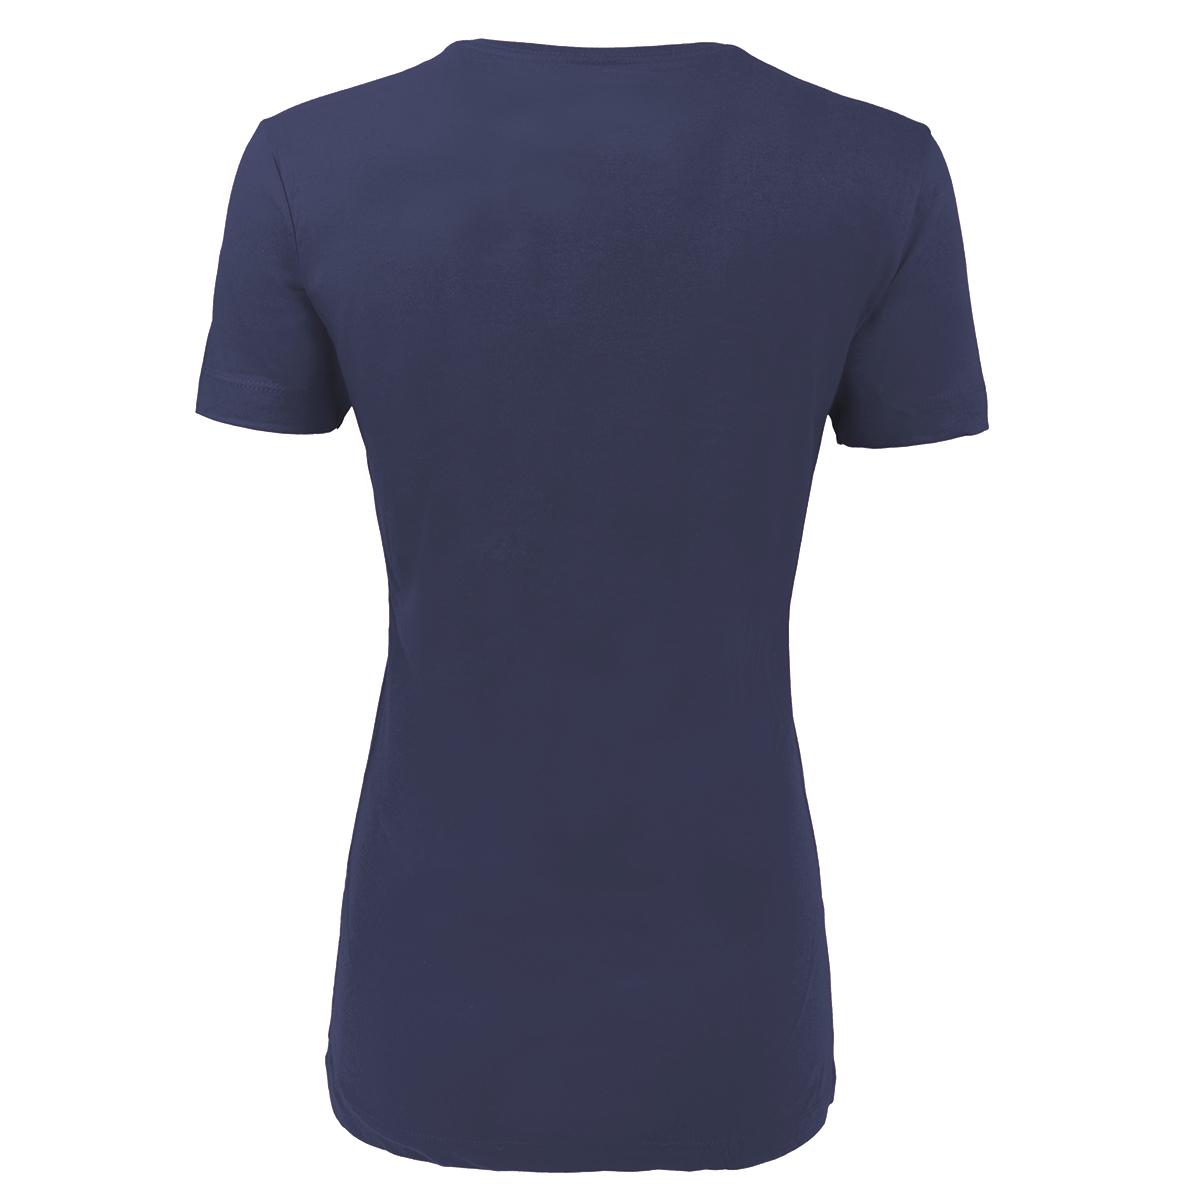 Nike-Women-039-s-Cotton-Slim-Fit-T-Shirt thumbnail 3